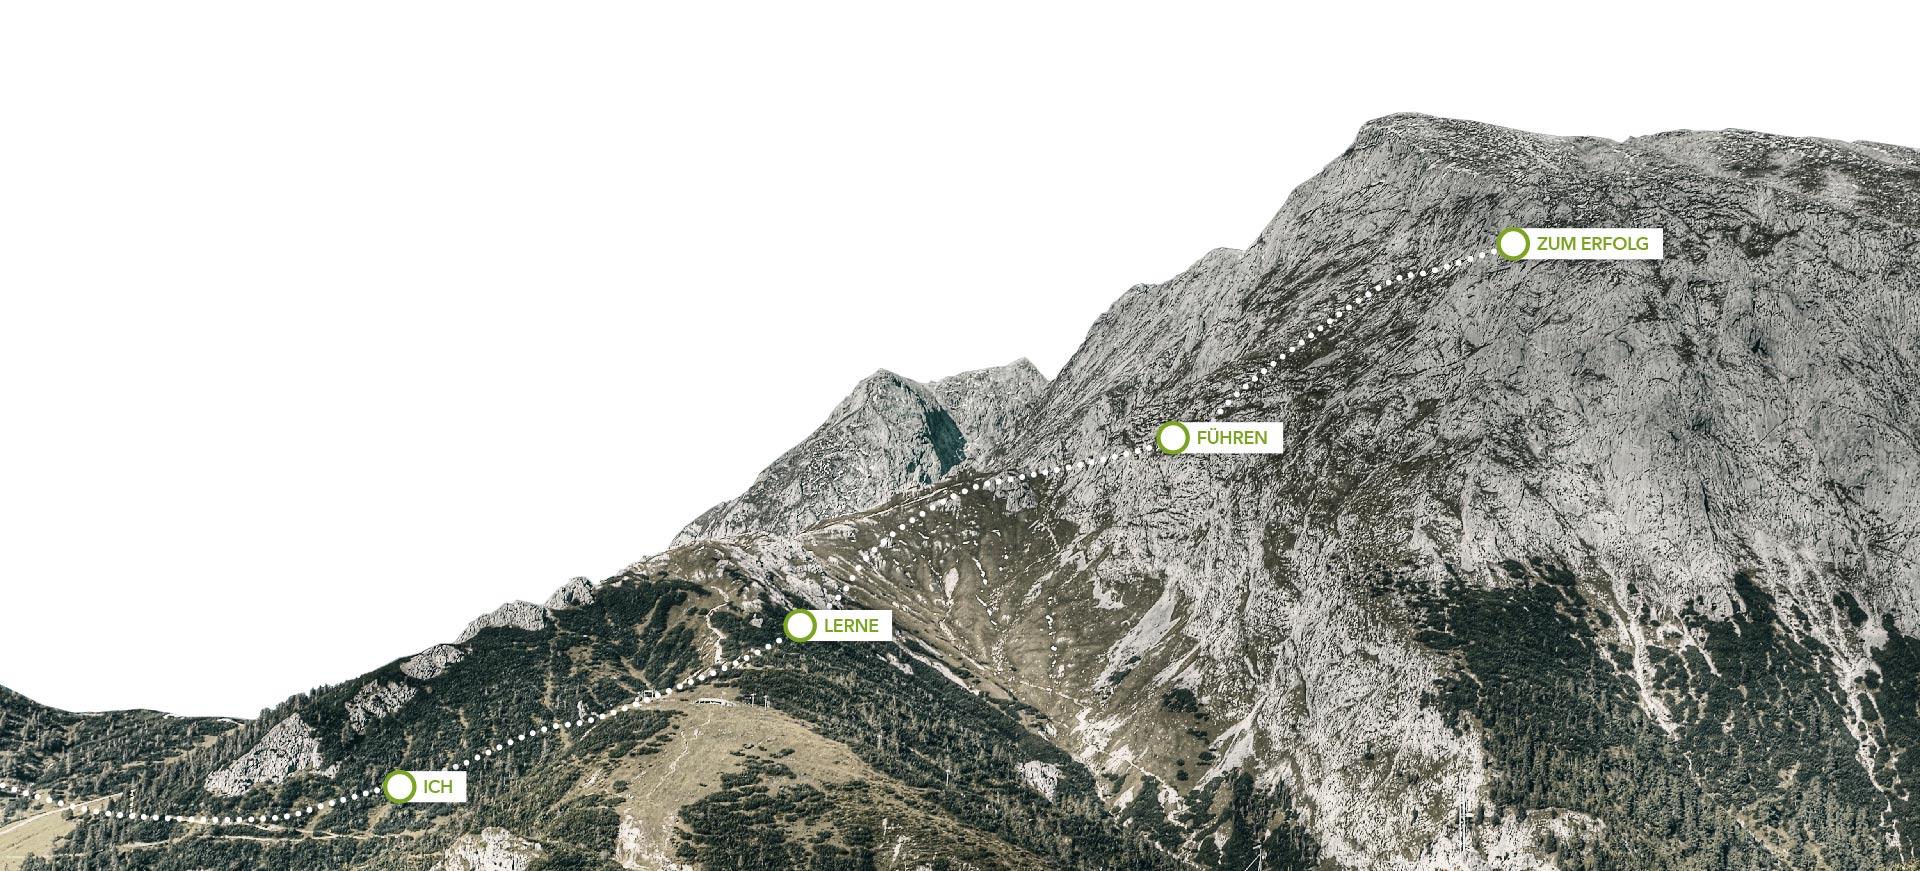 Footerbild Bergsilhouette